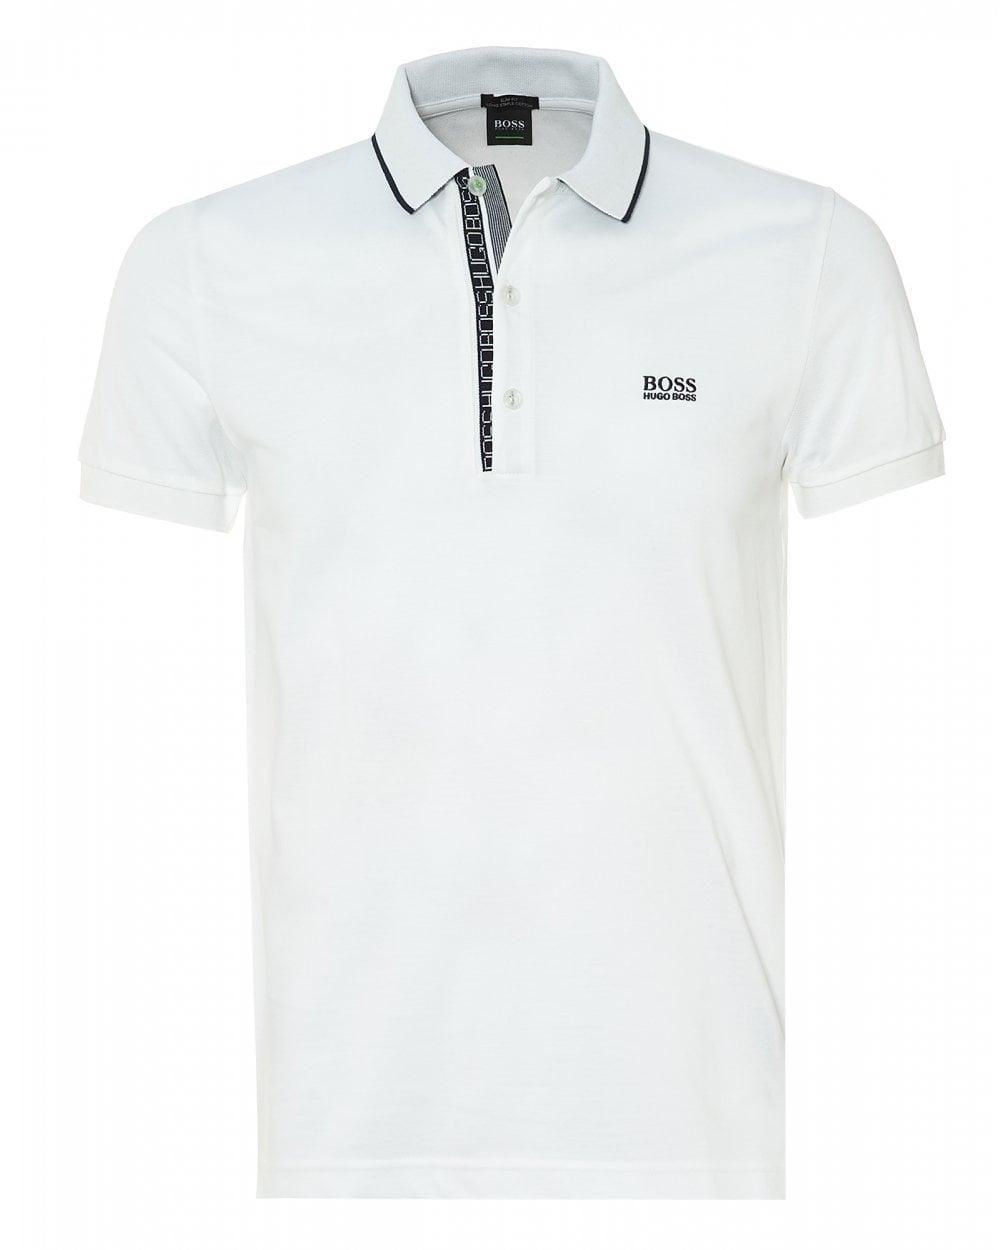 f141ff0e0696 BOSS Athleisure Mens Paule 4 Polo, Slim Fit White Polo Shirt